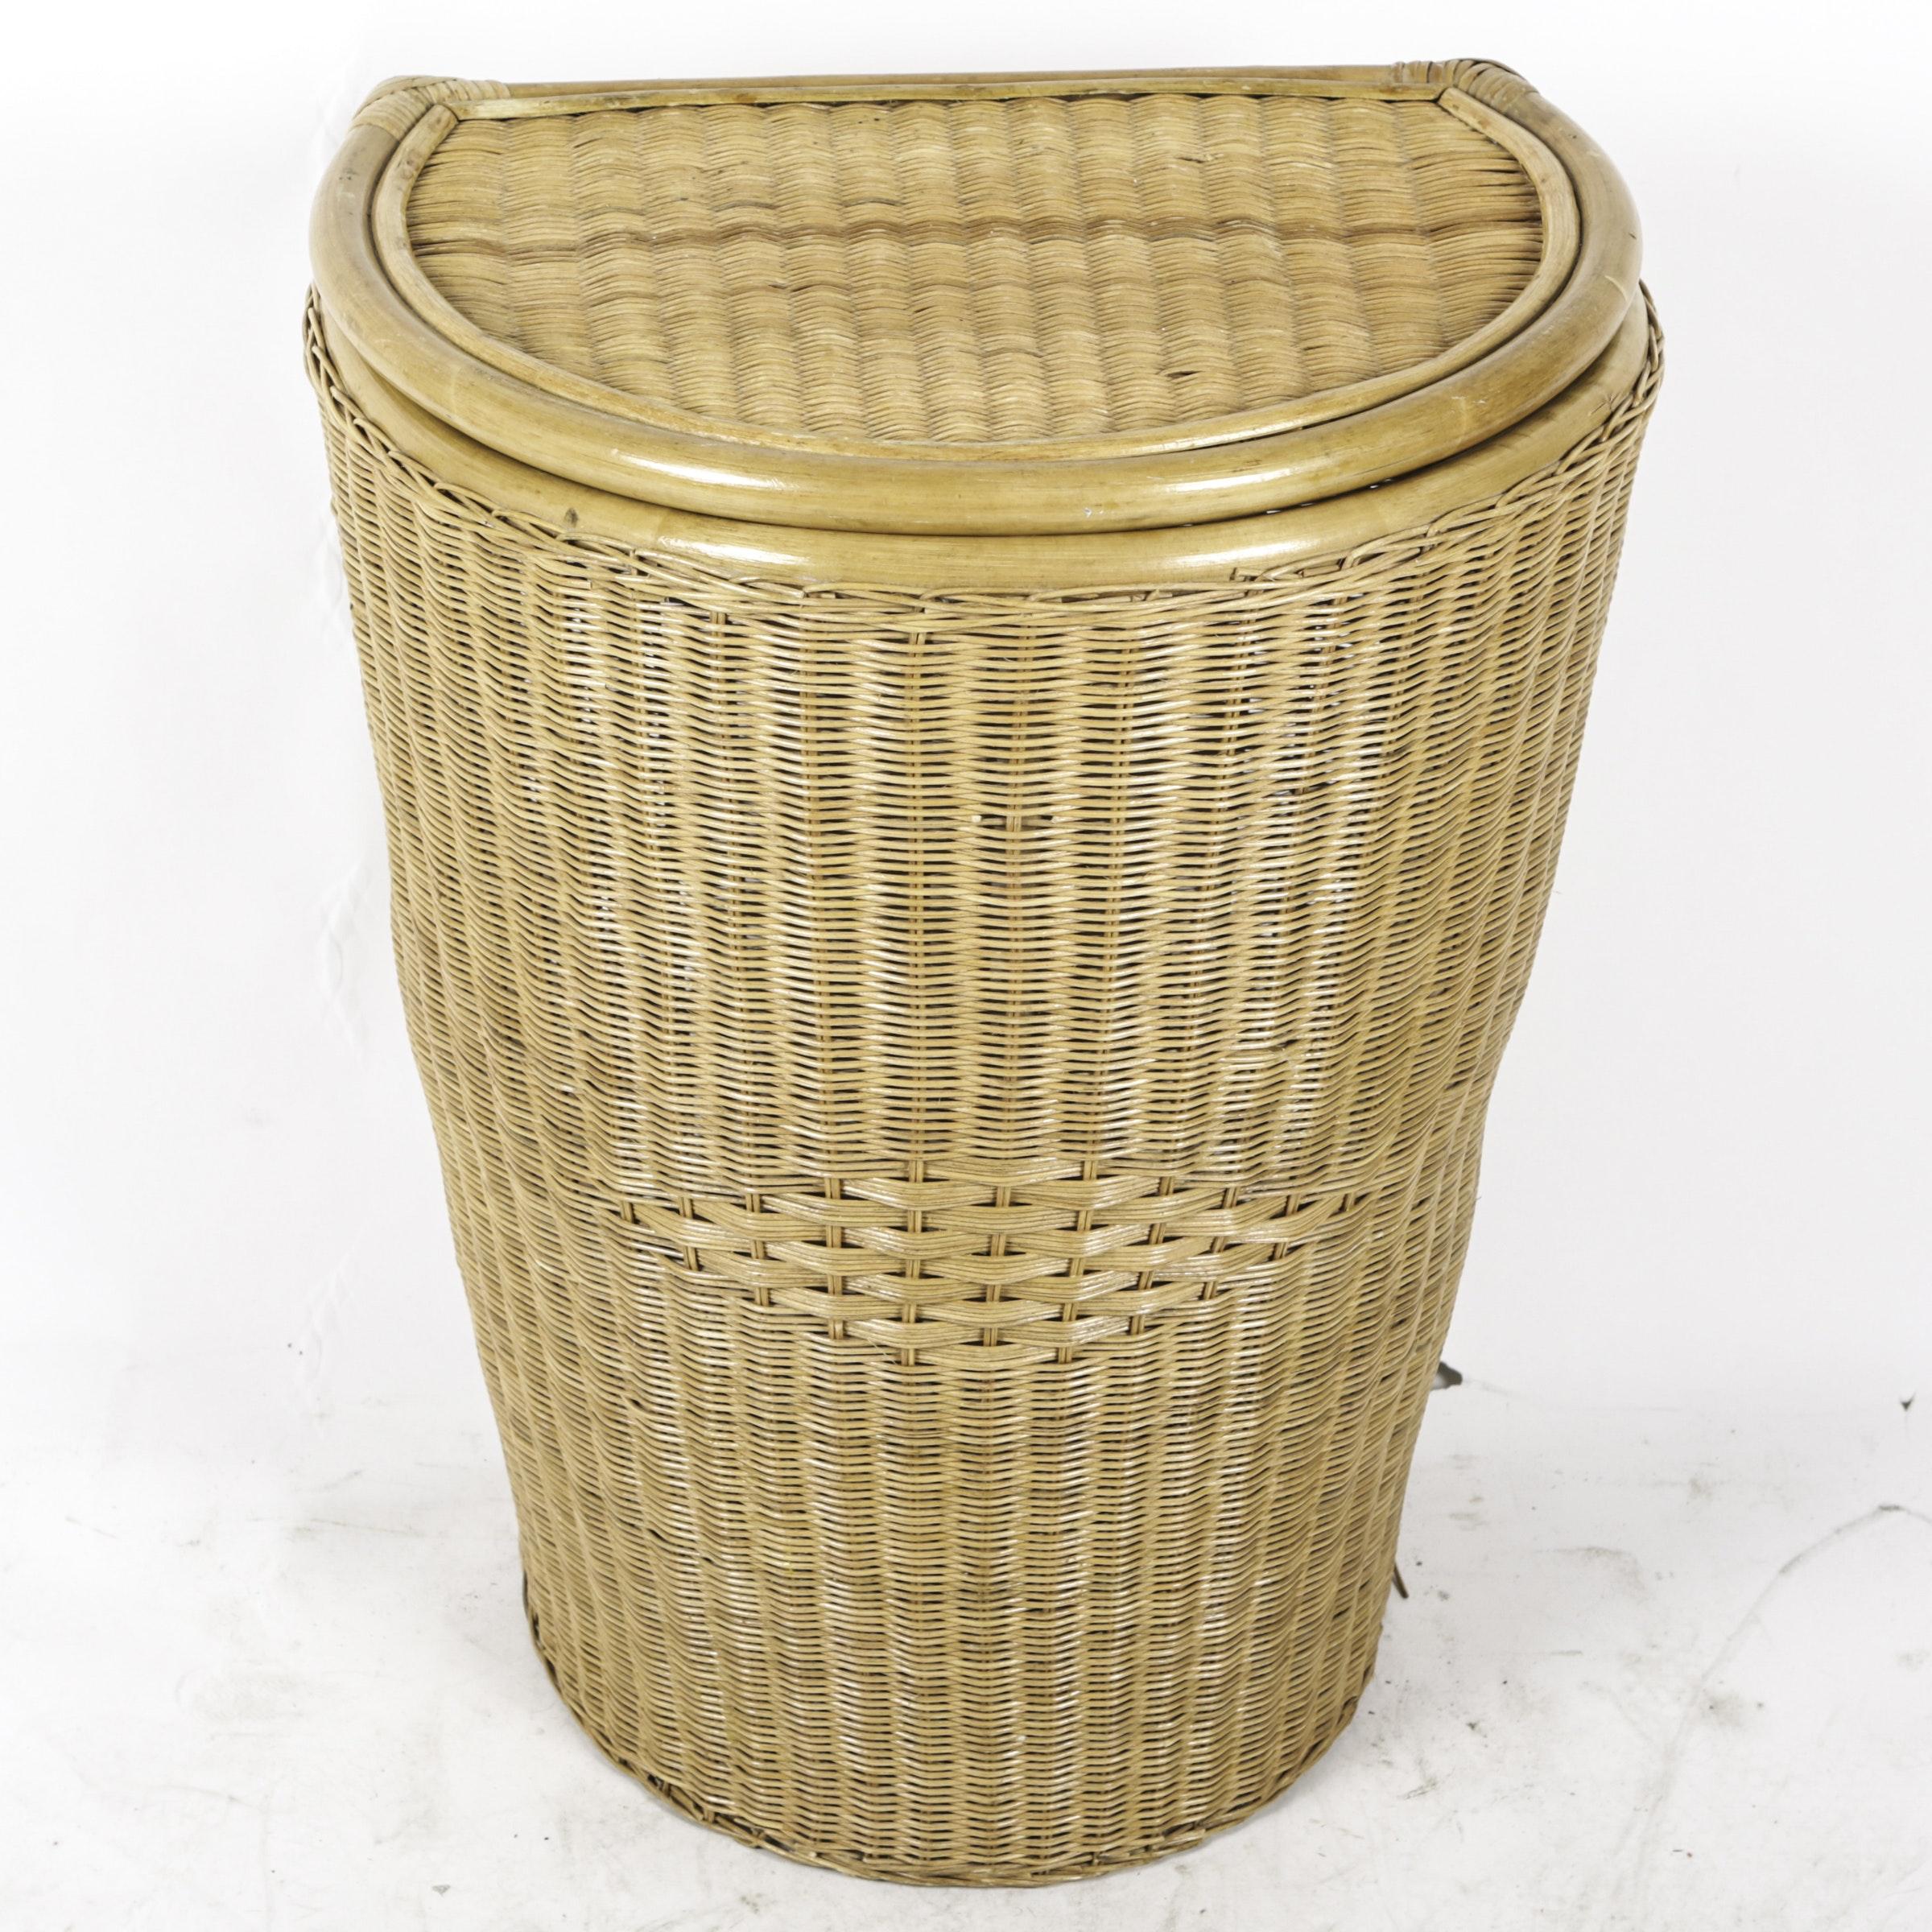 Vintage Lidded Woven Laundry Basket